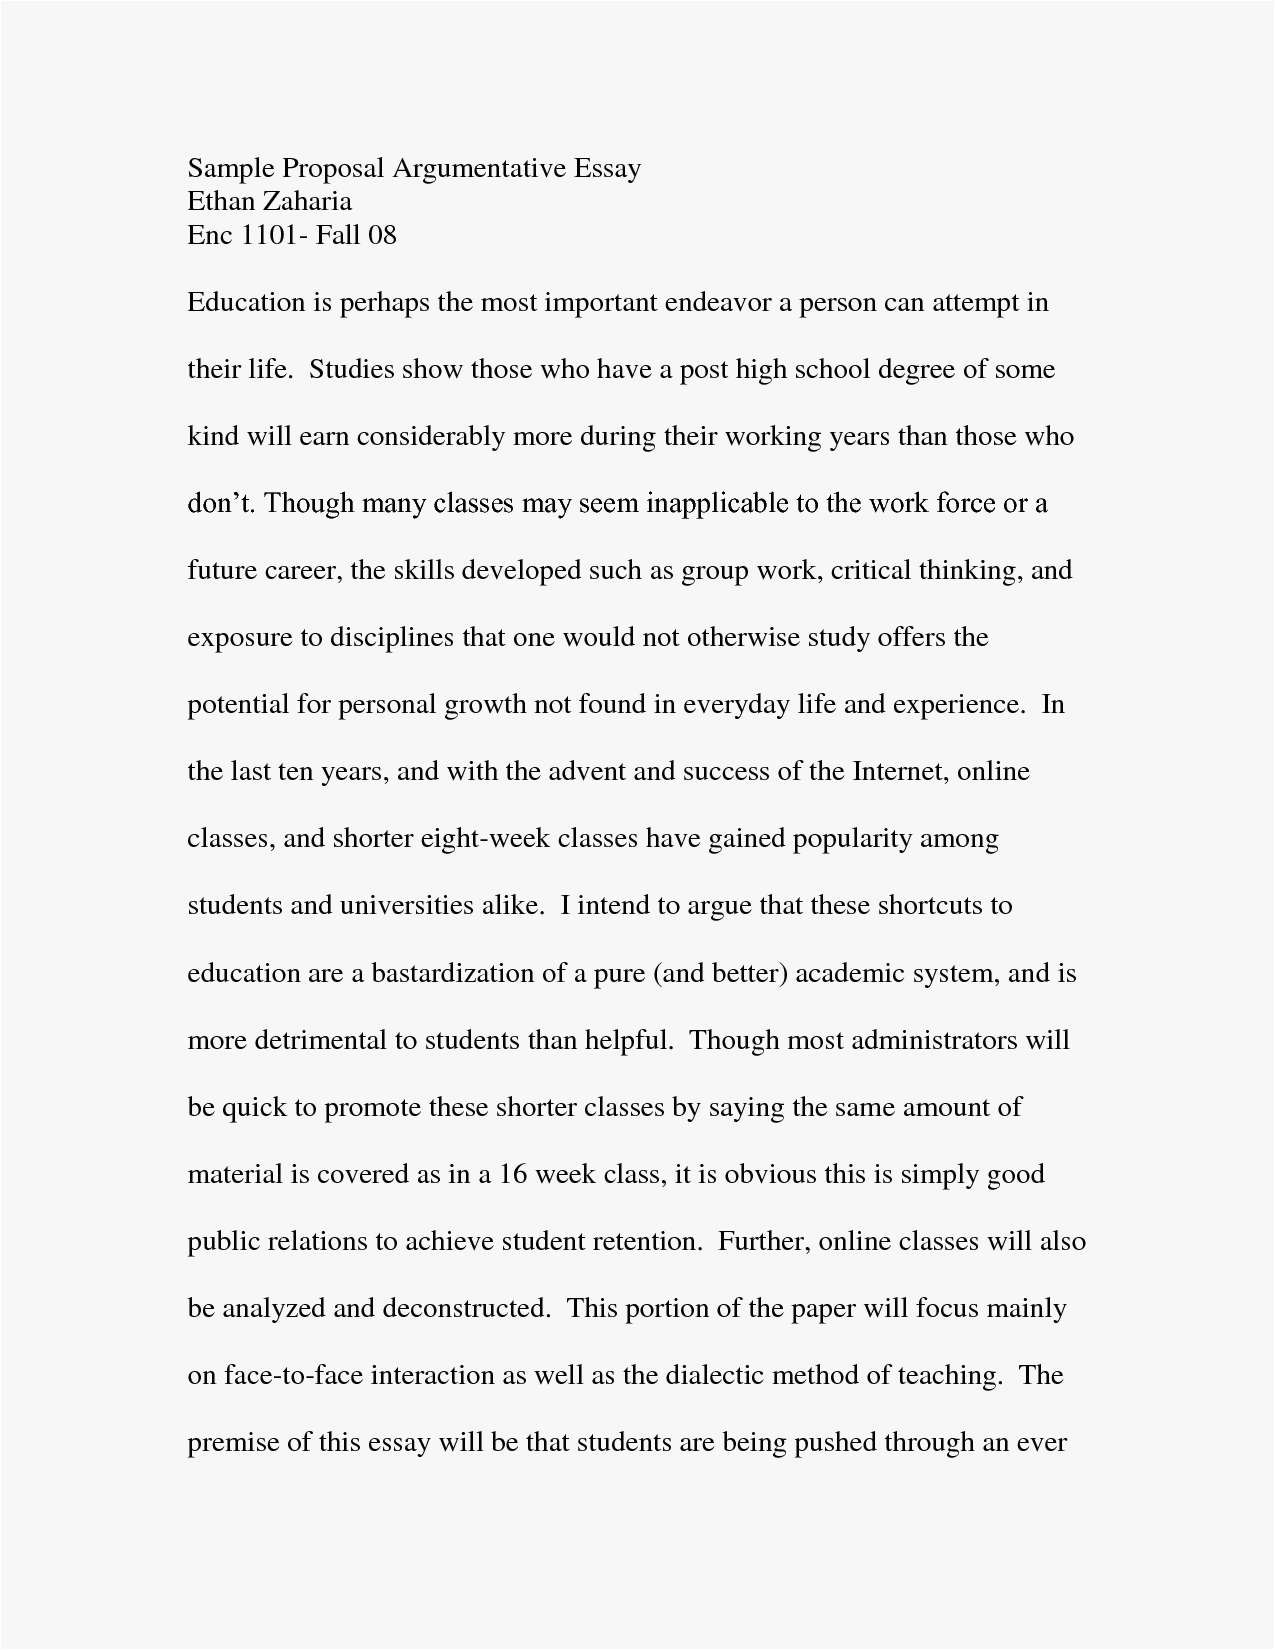 007 Racism Argumentative Essay Unique Proposal Arguments Model Essays About Of On Unbelievable In Schools Best Full